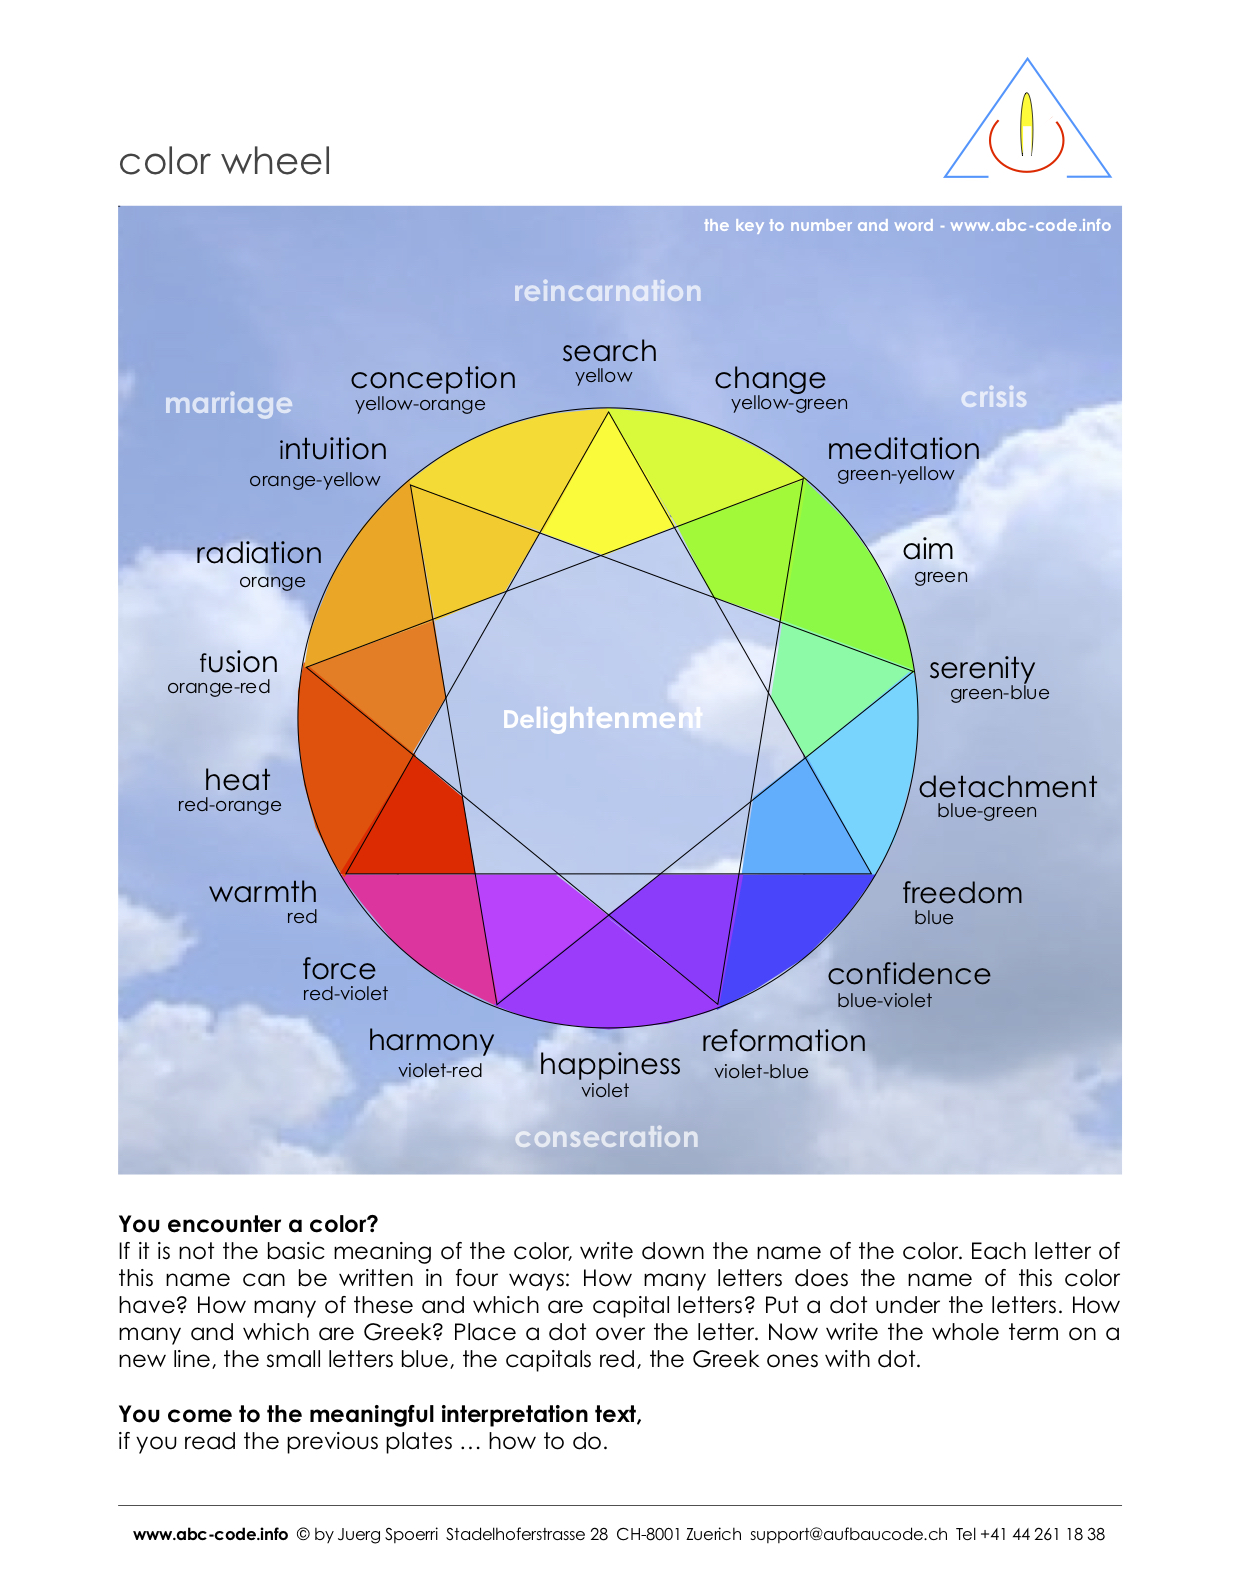 abc-code.info - color wheel